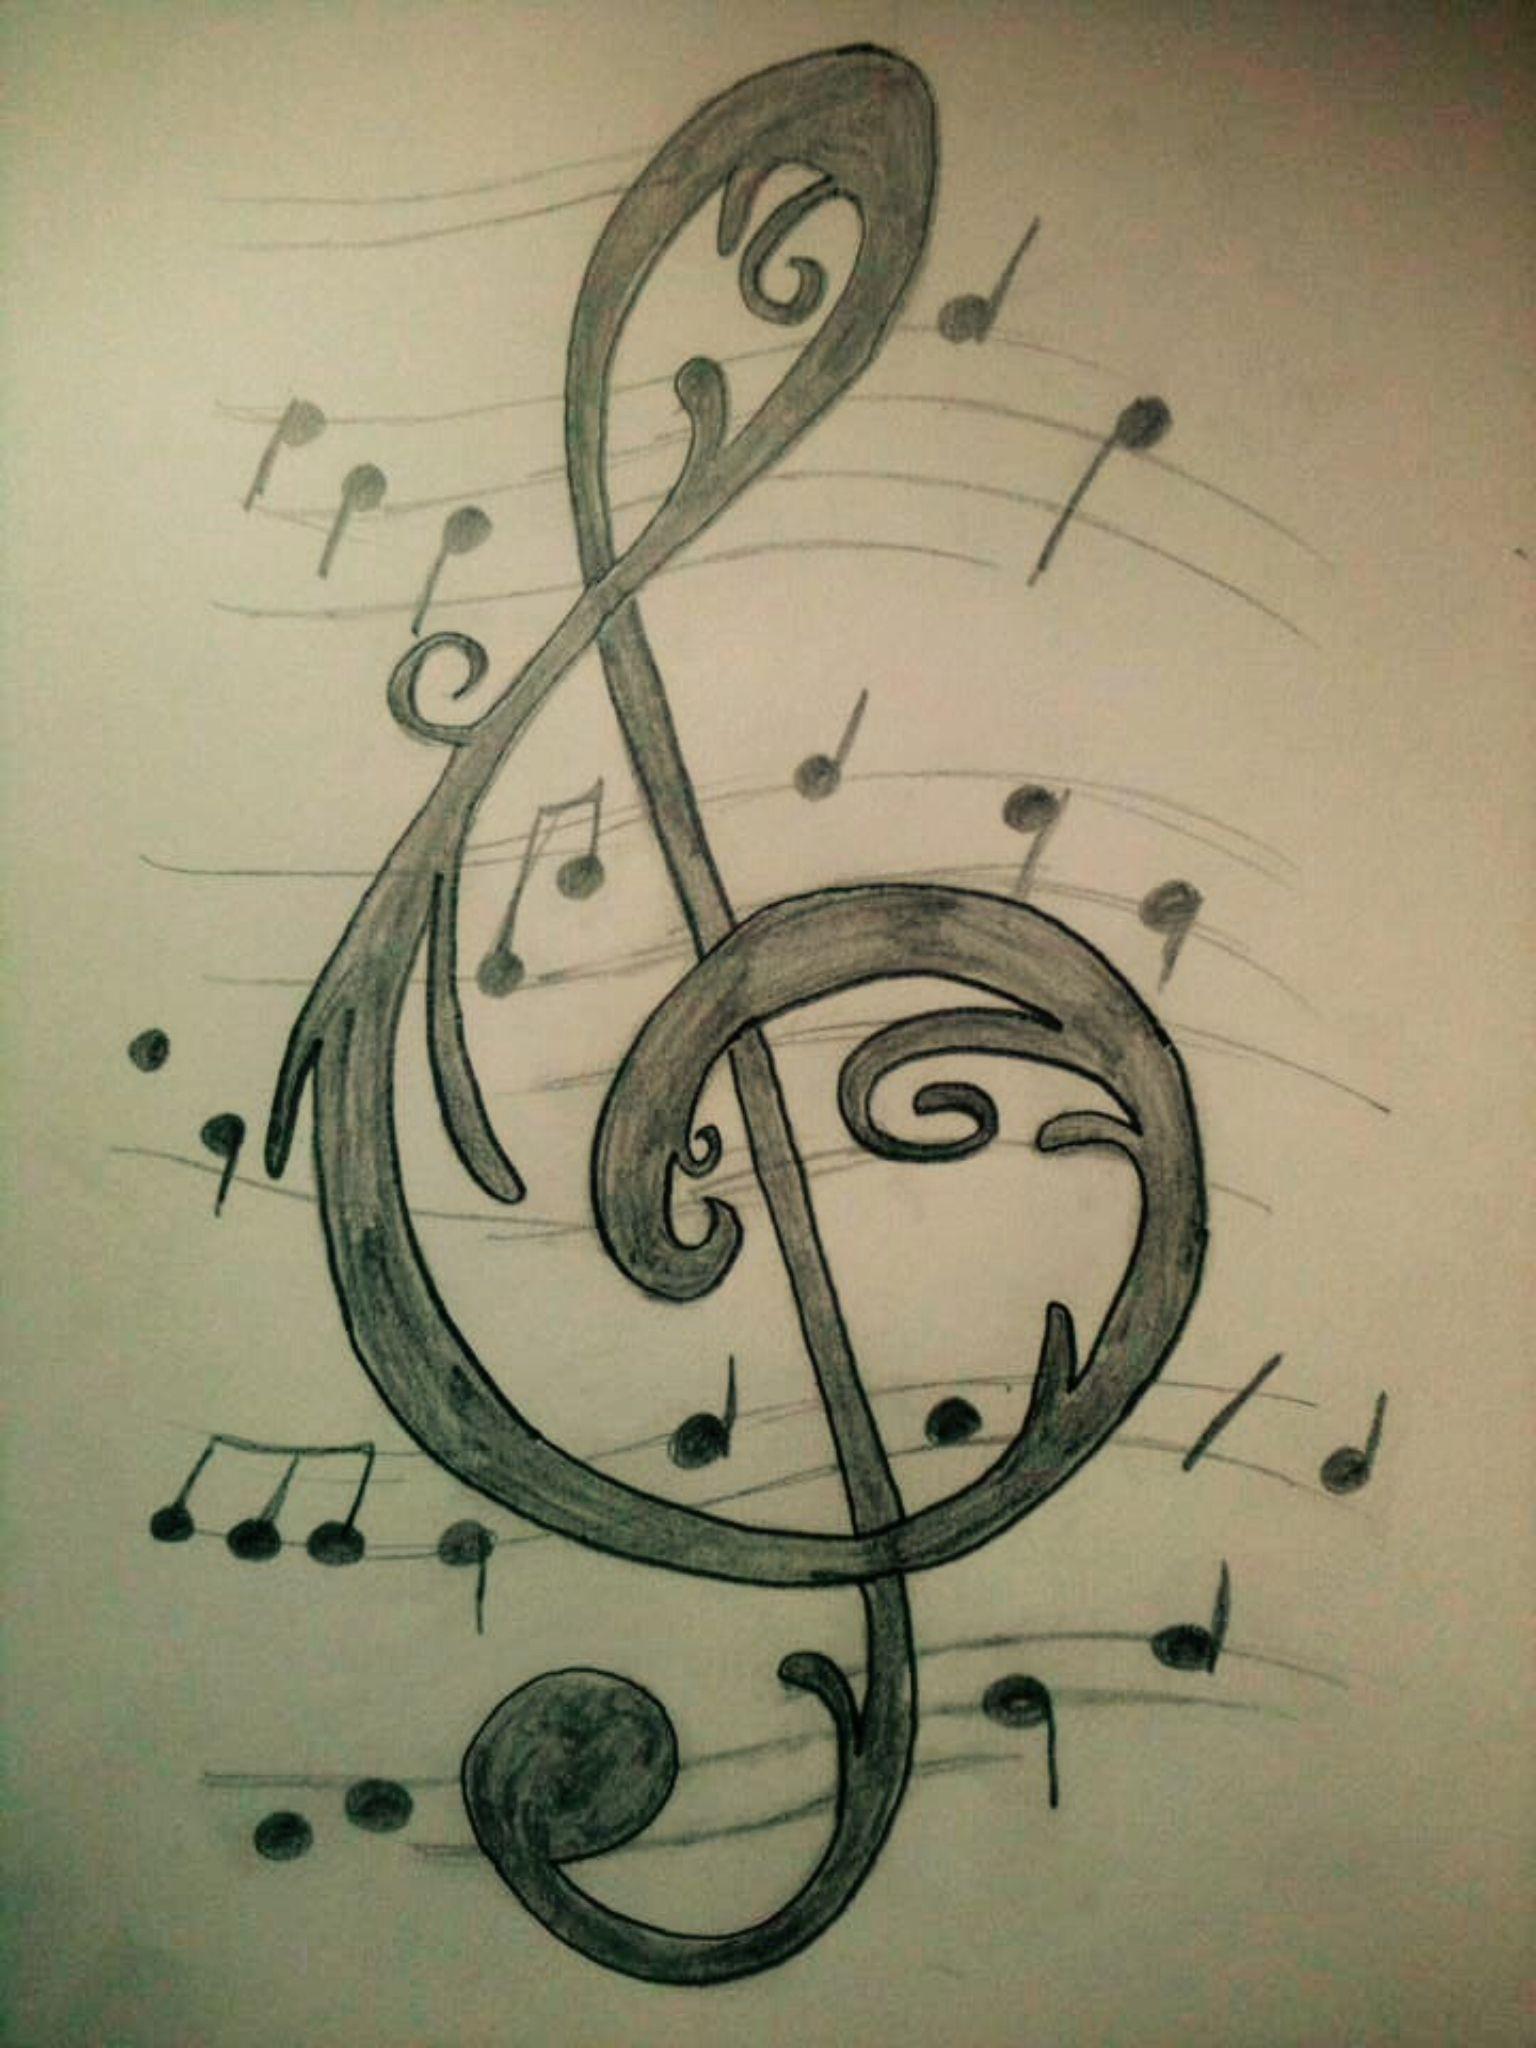 dibujos drawings sol clave notes sketches reveles alejandra musica notas musicales stencil note draw sketching lapiz negro